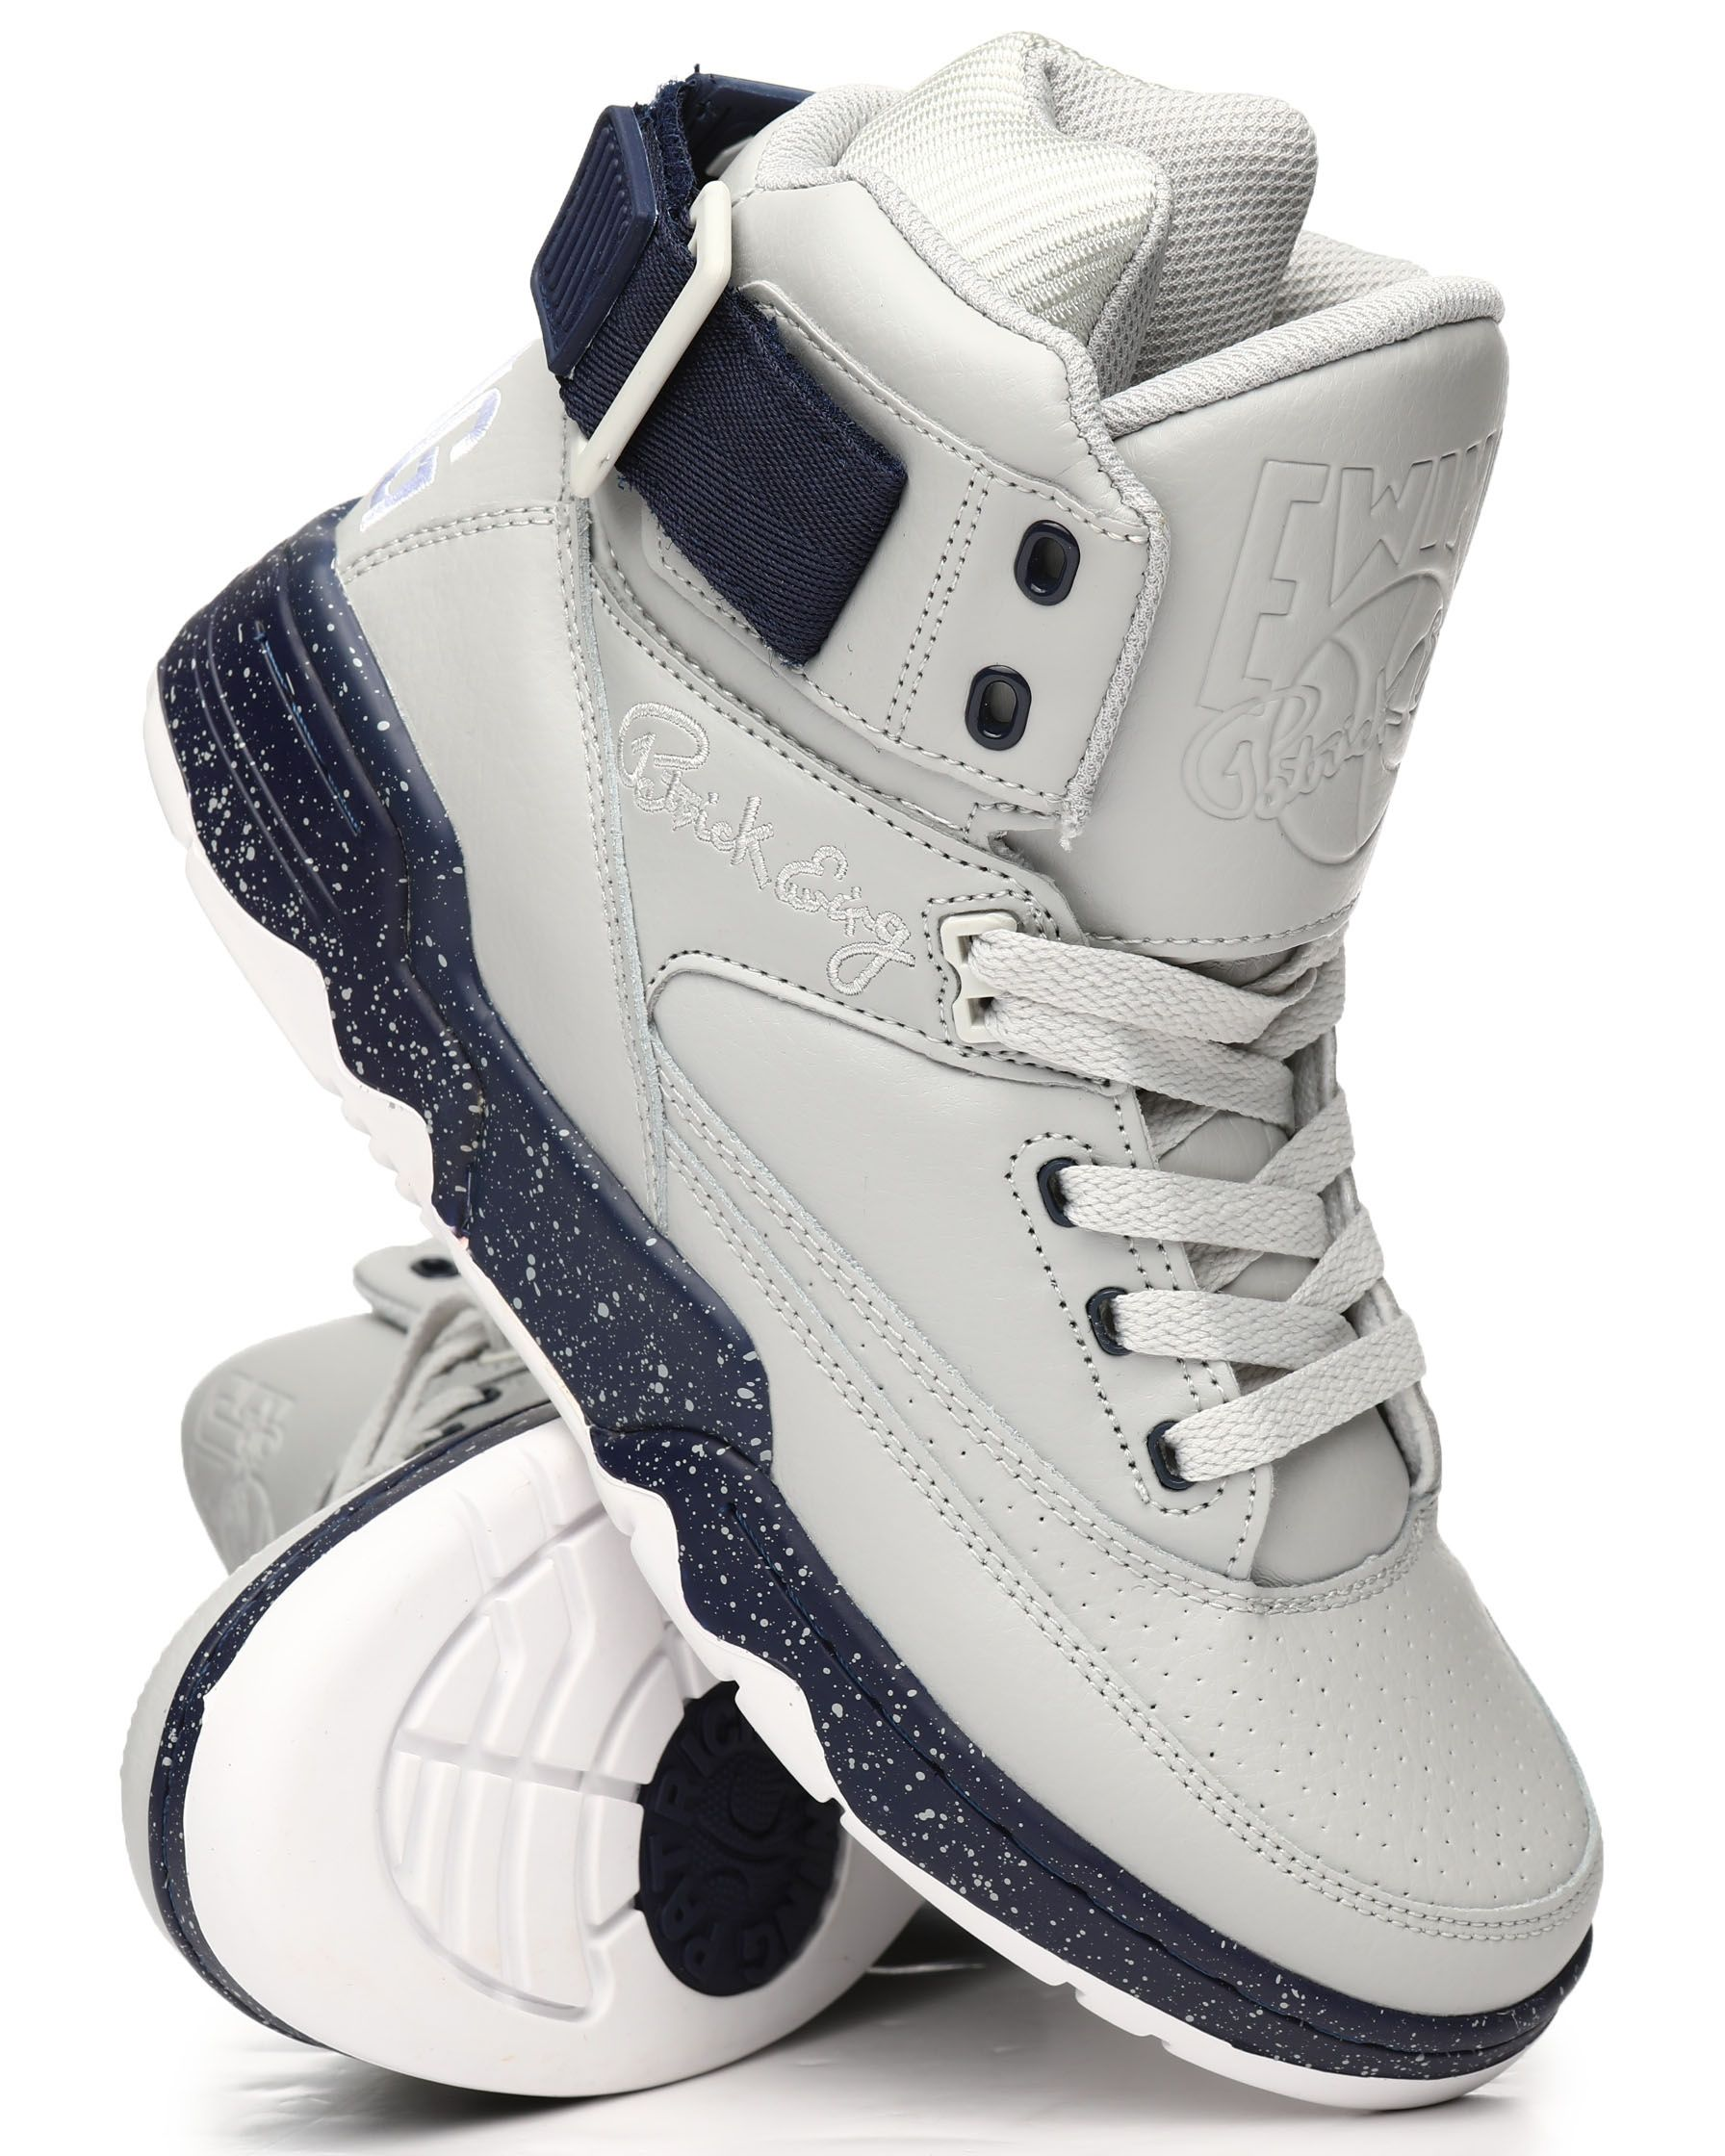 Ewing 33 Hi Sneakers Men's Footwear from EWING at DrJays